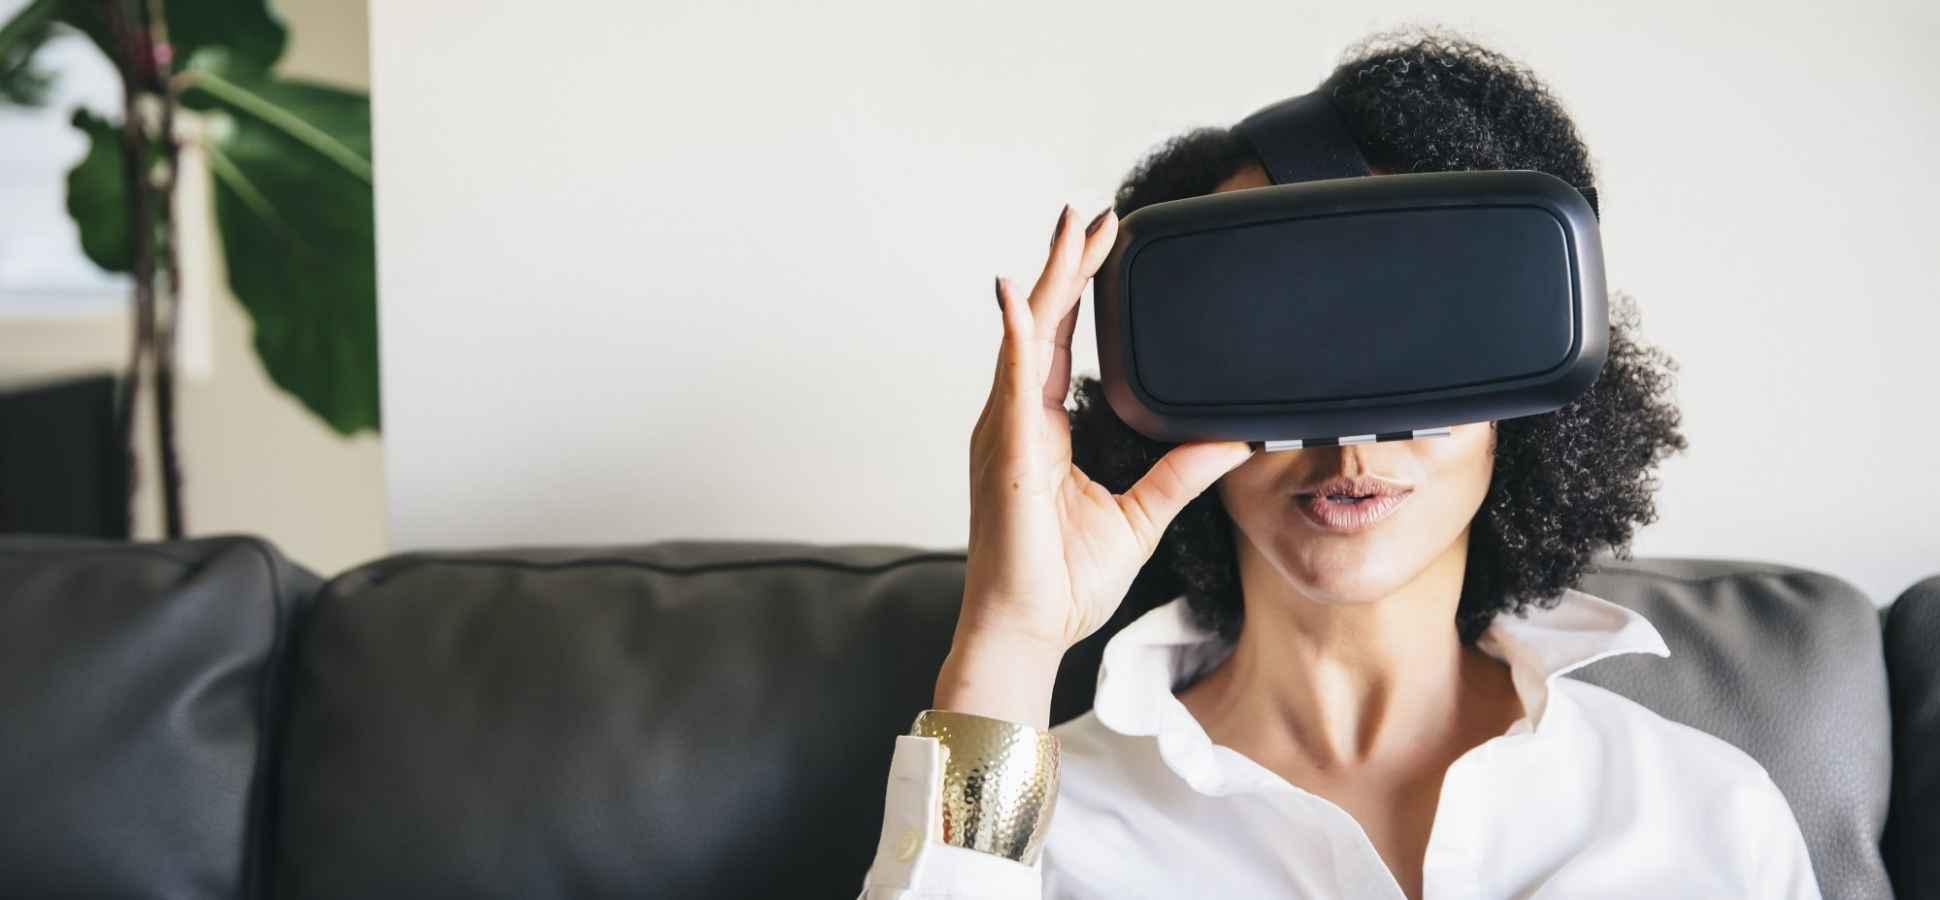 Revolutionizing Digital Marketing: Virtual Reality and Augmented Reality